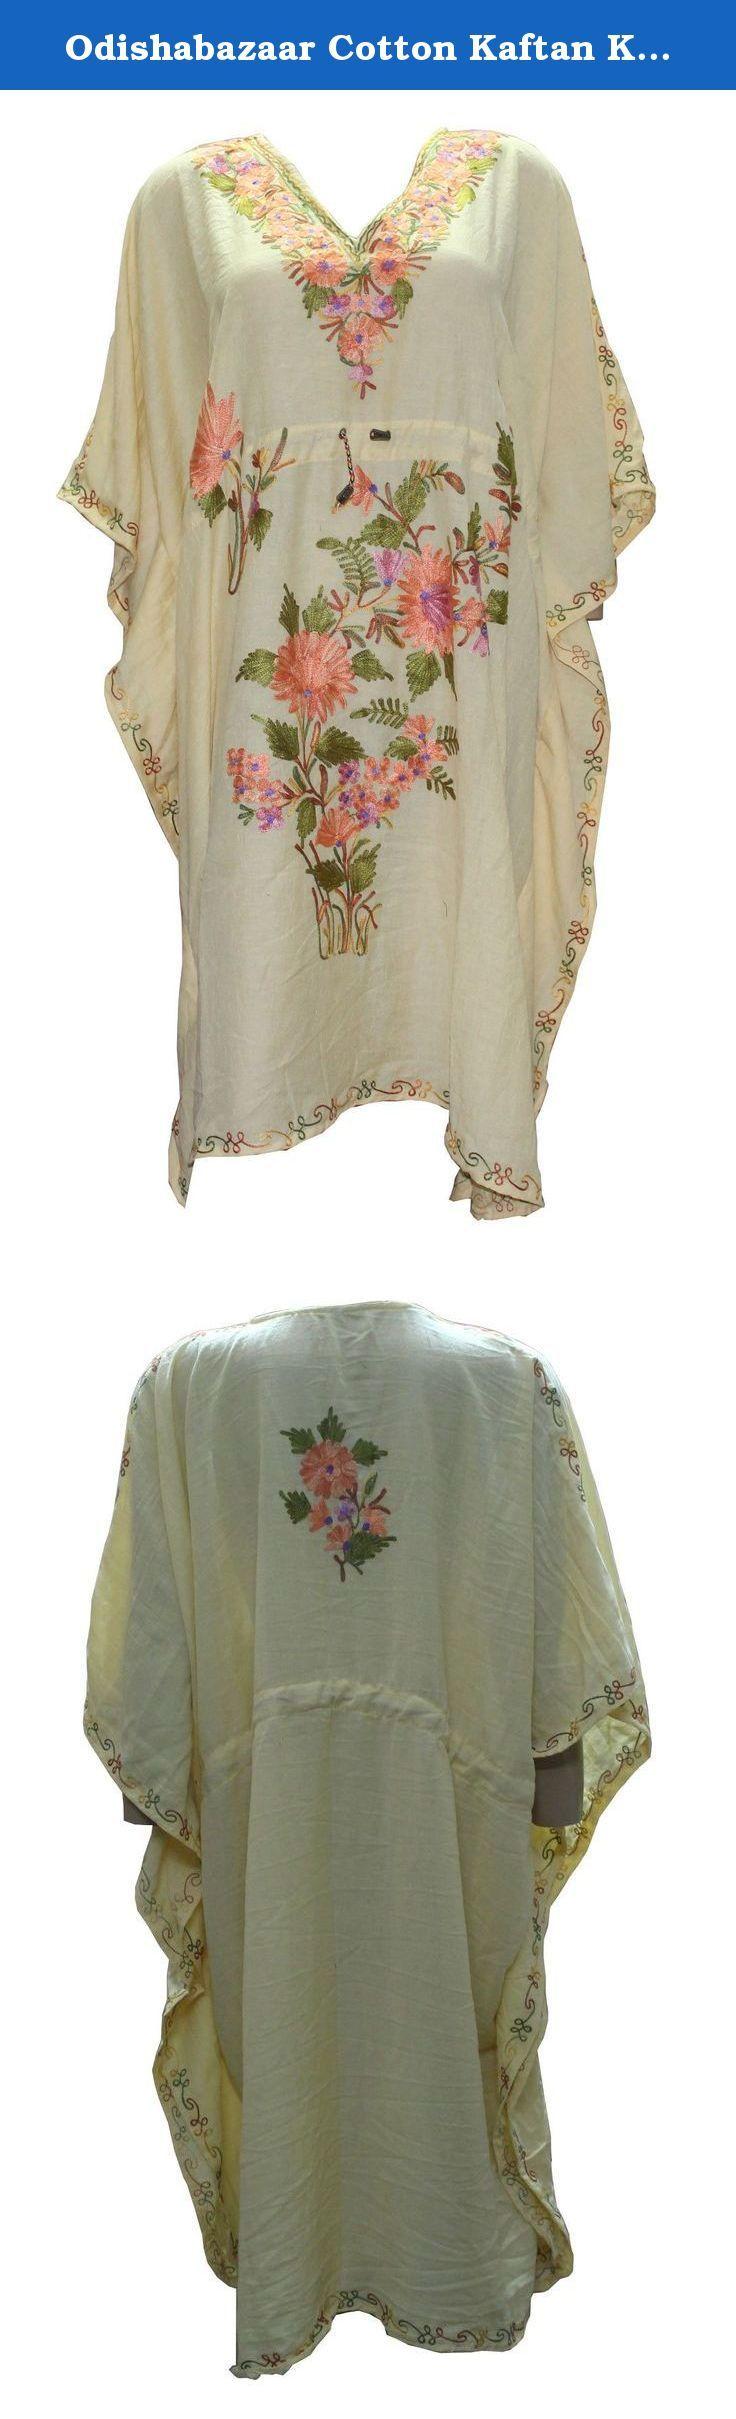 Odishabazaar Cotton Kaftan Kashmiri Embroidered Short Length Dress for Women (multi-9). Short length Kashmiri Kaftan/lounge wear/beach wear/ Sort dress with Ari Embroidered Flowers.